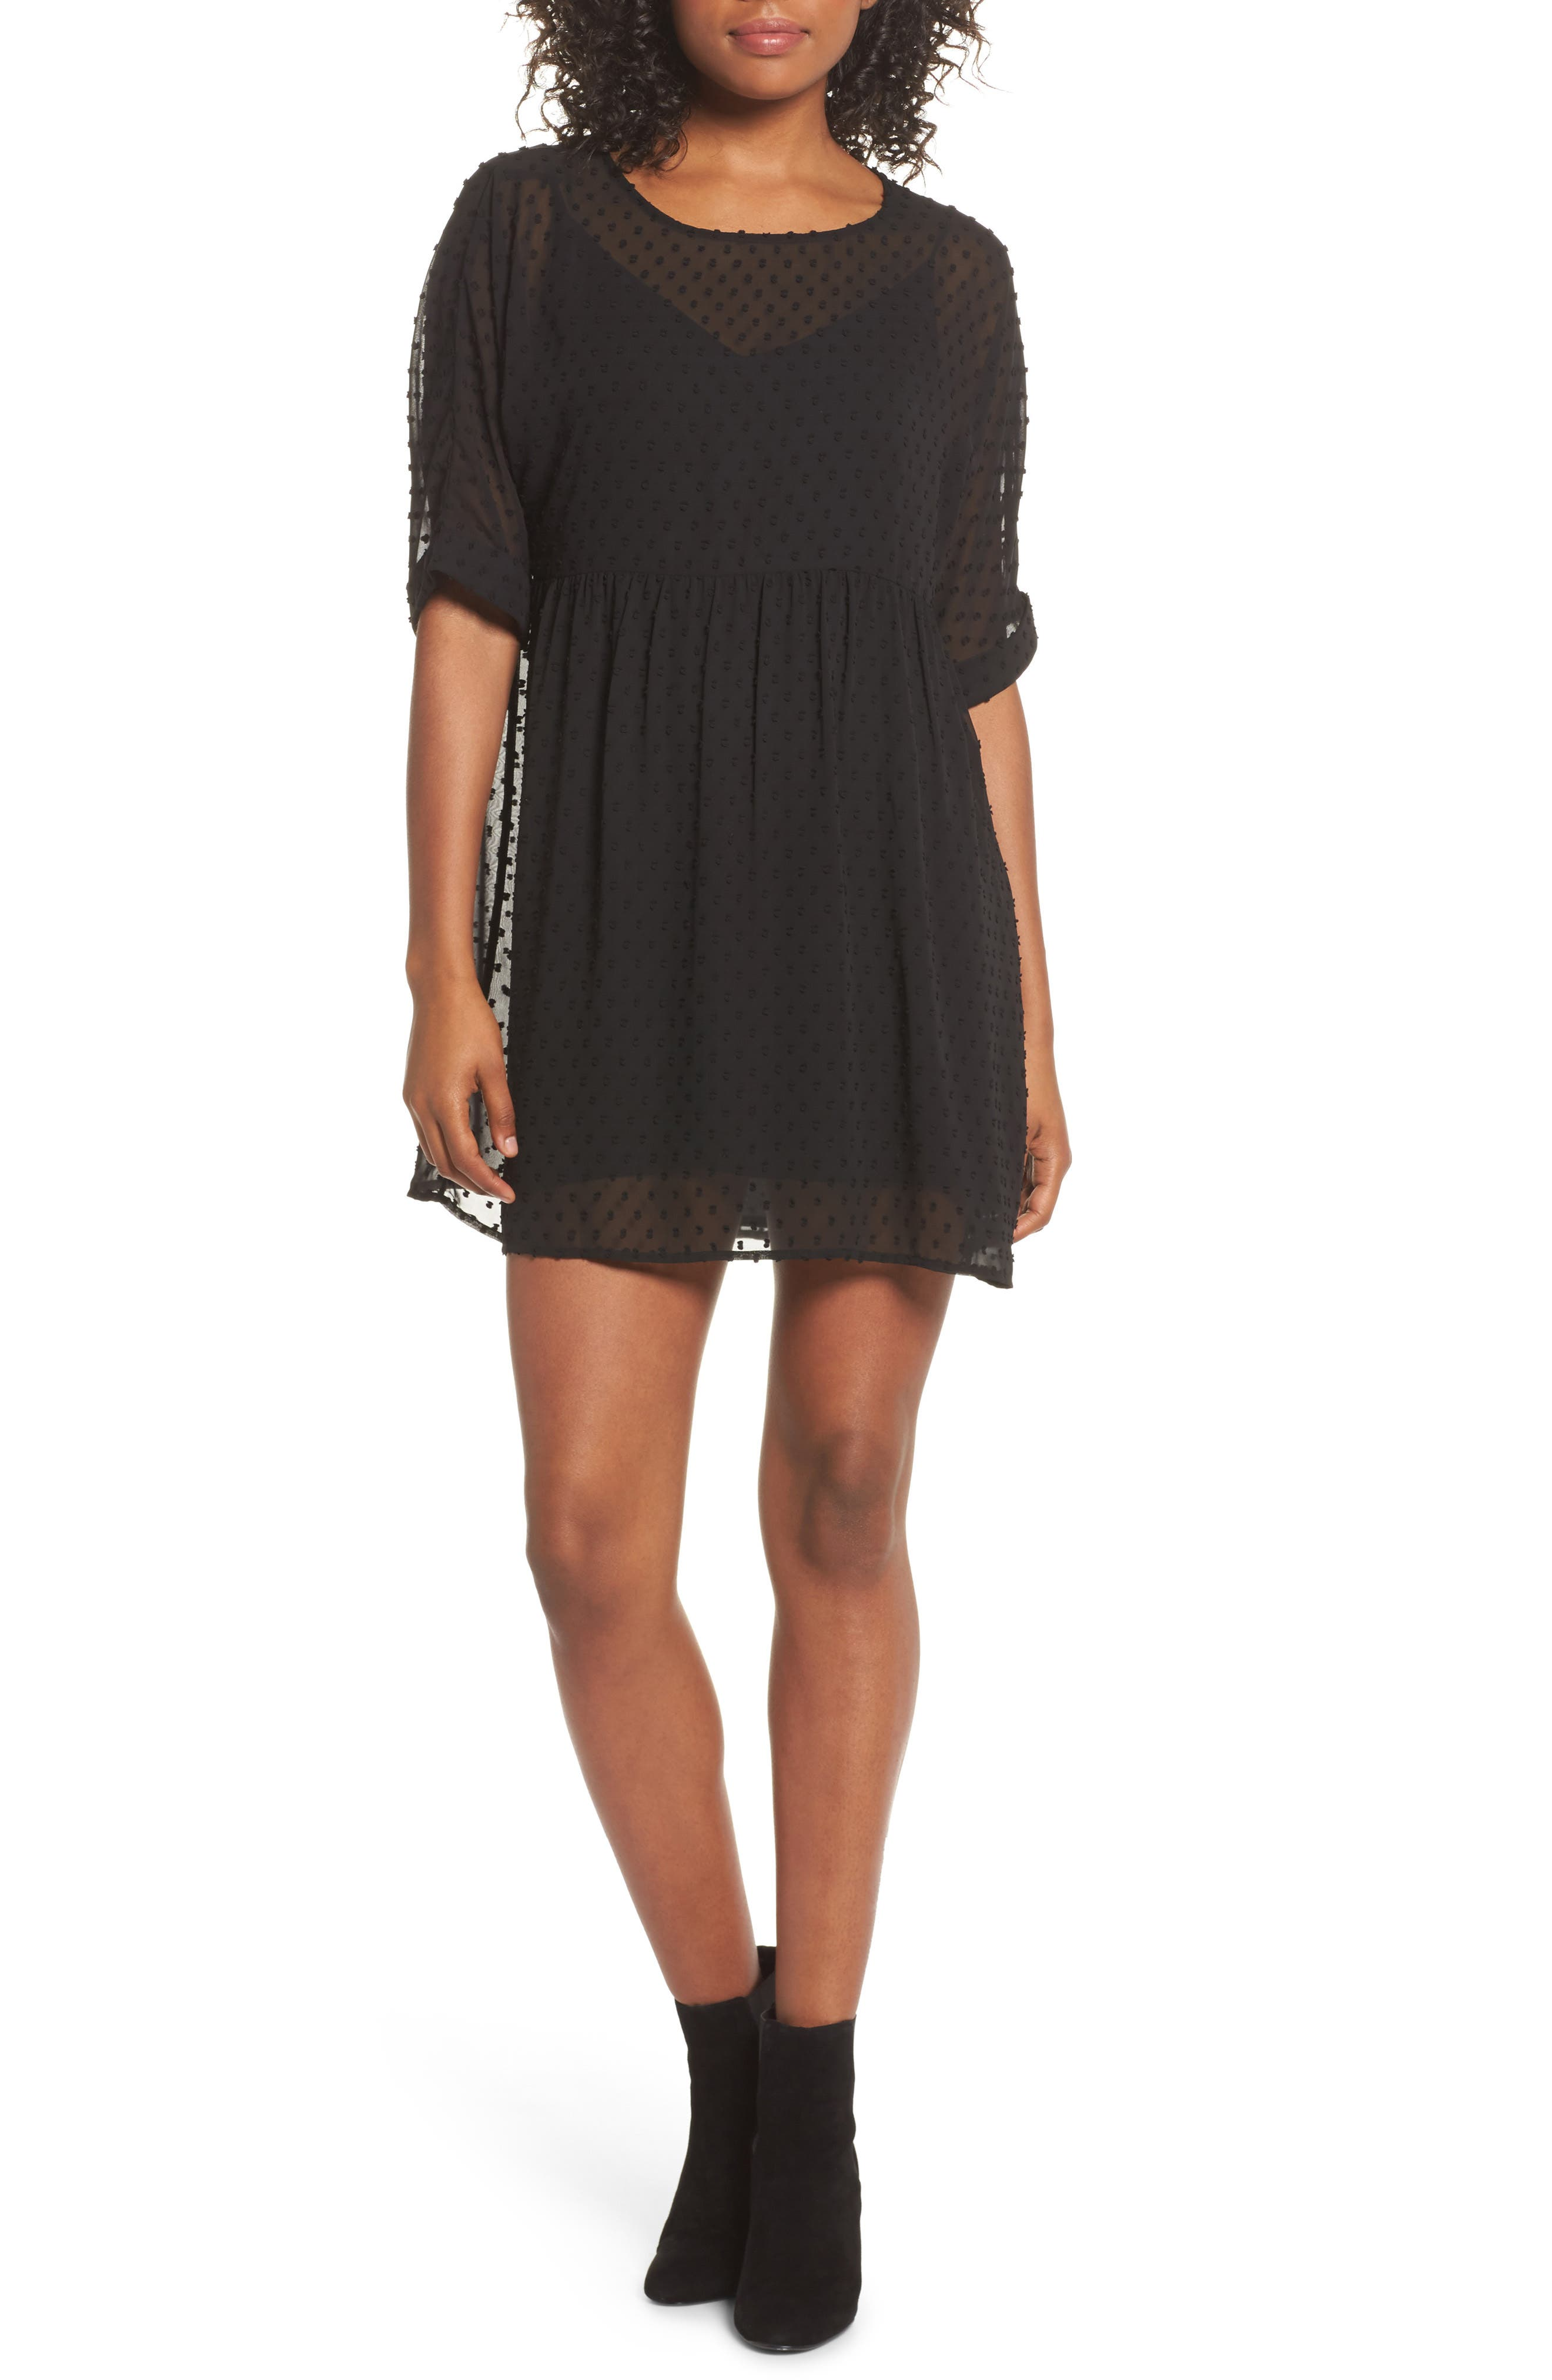 Bryden Minidress,                         Main,                         color, Black